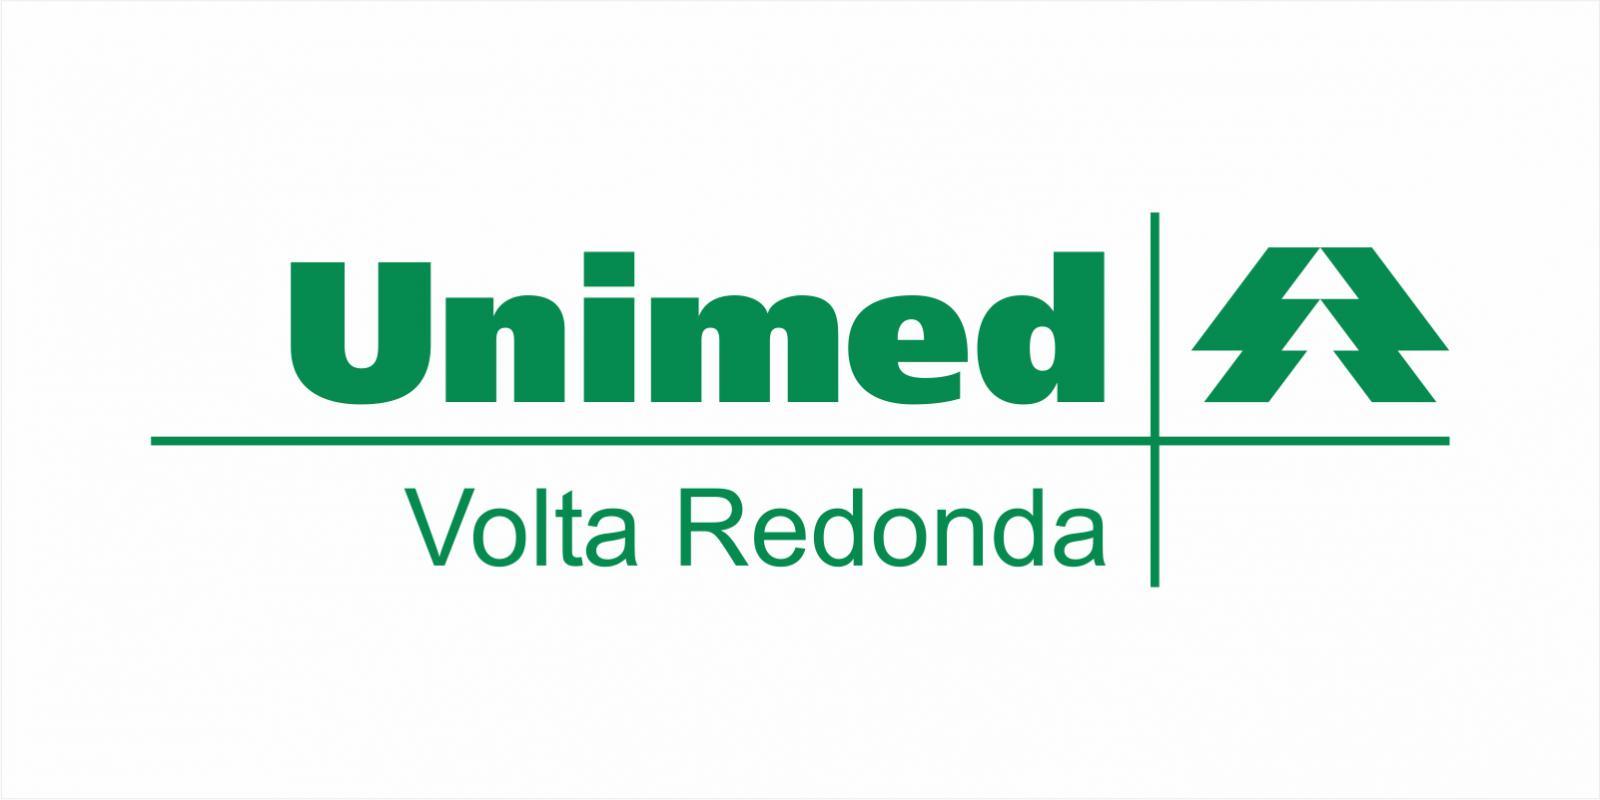 Unimed Volta Redonda